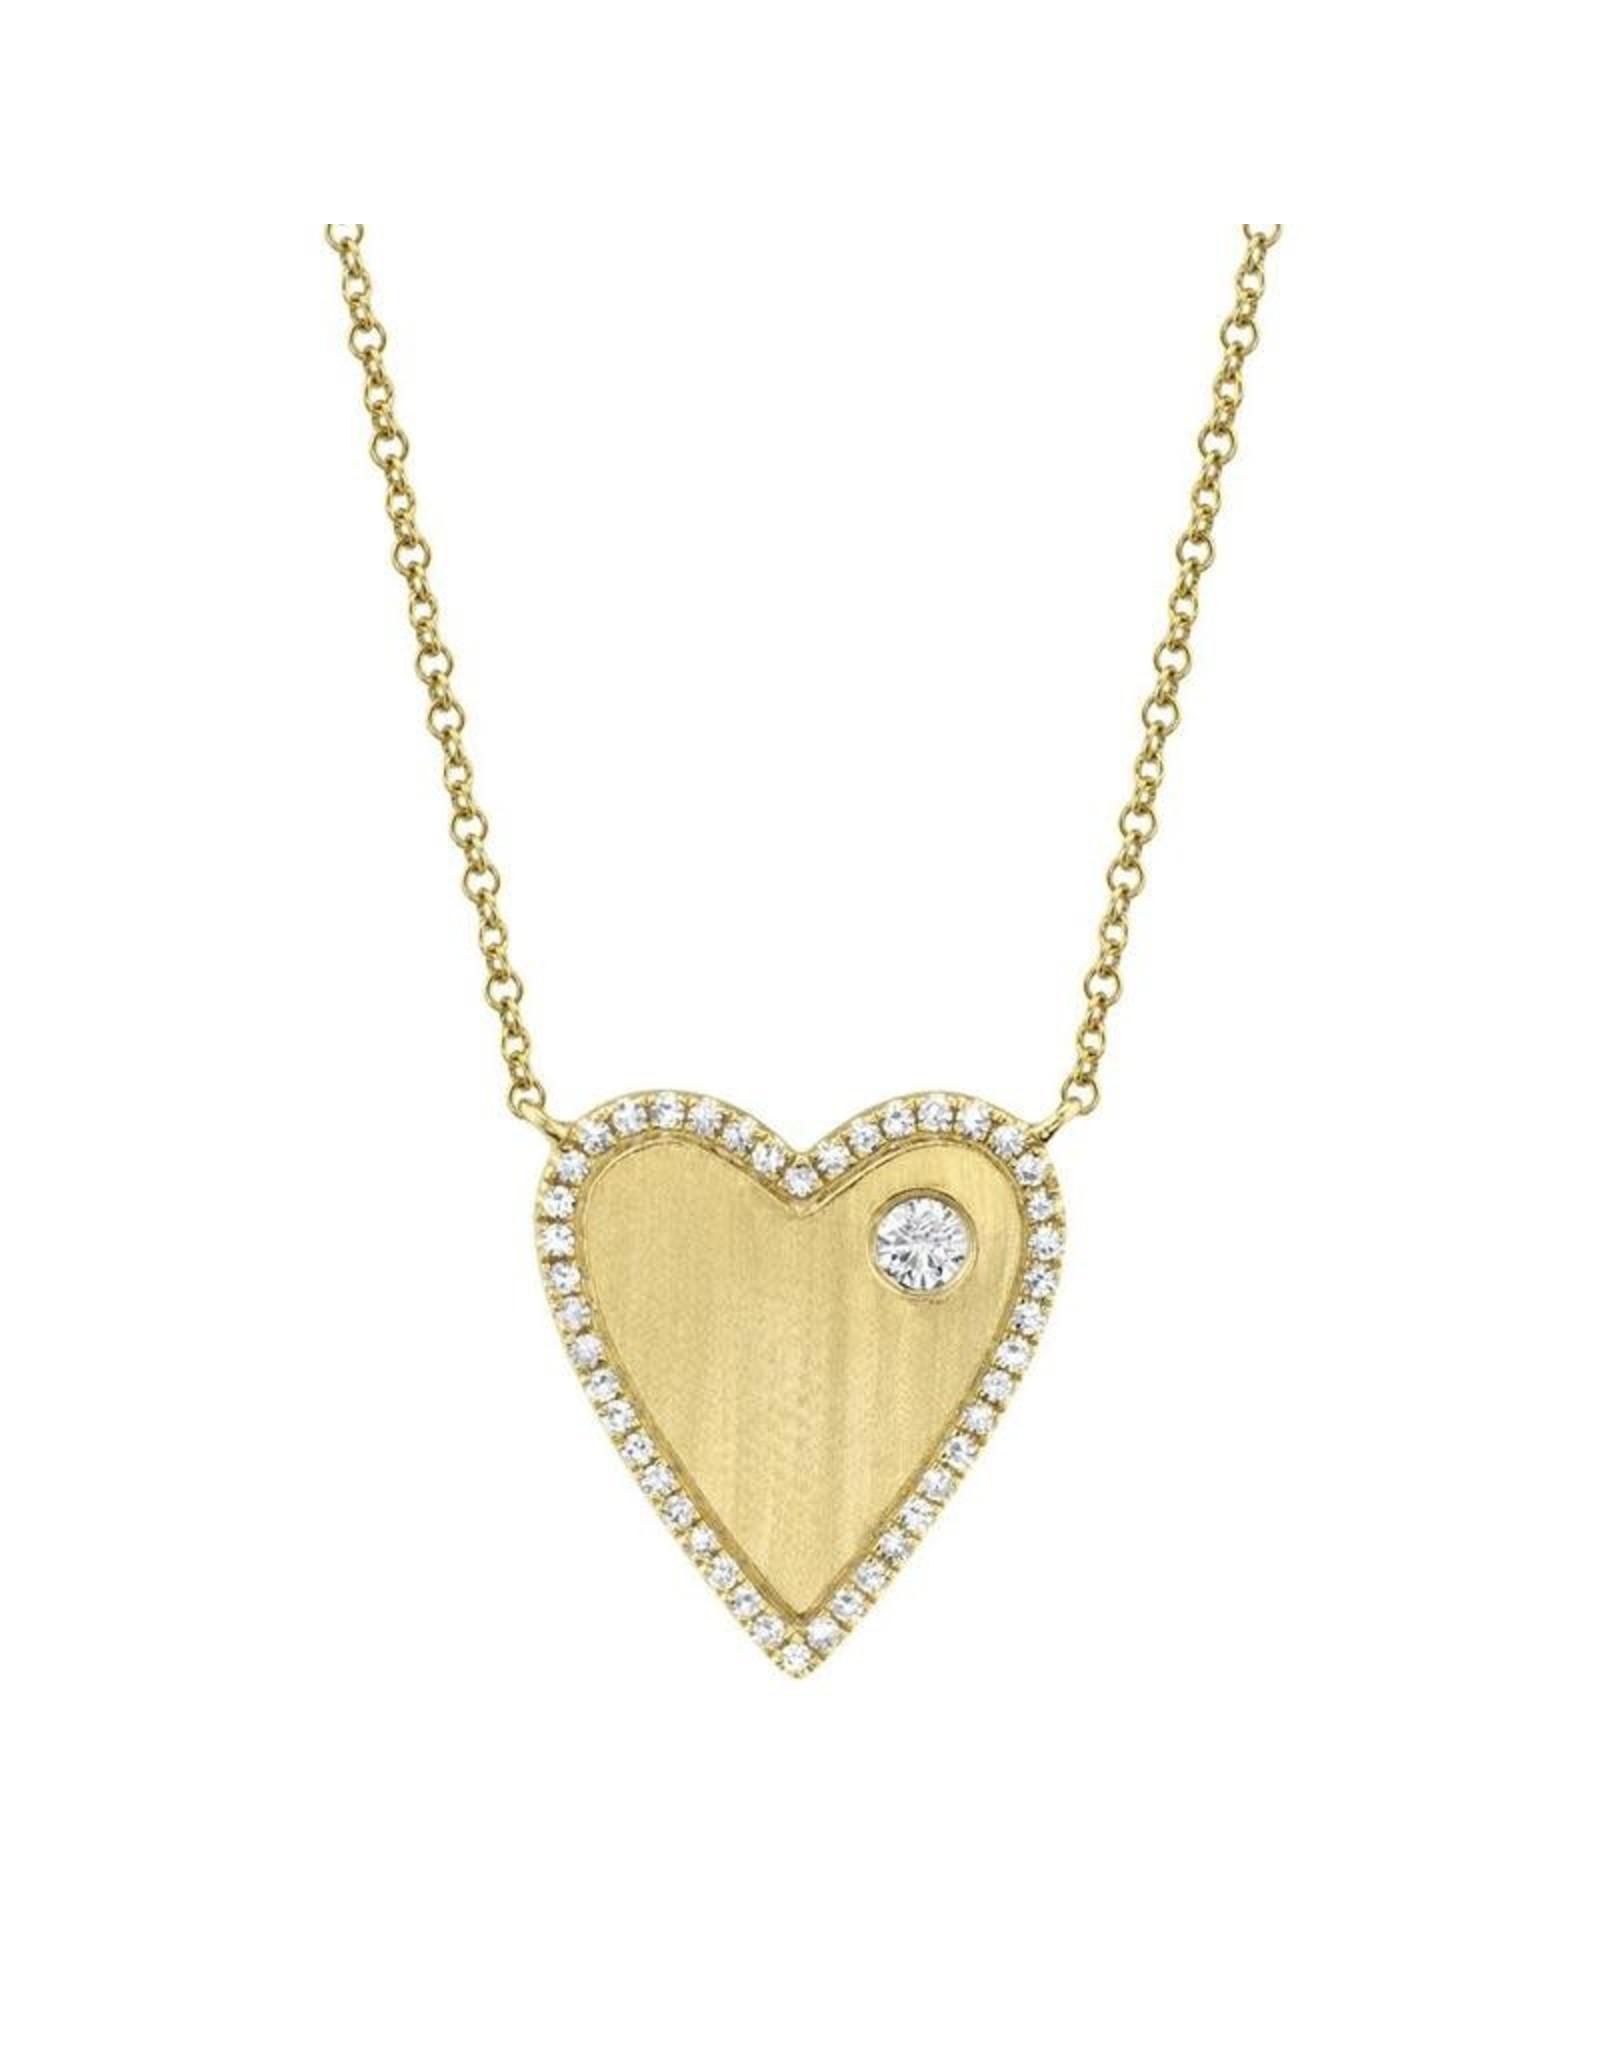 14K Yellow Gold Diamond Matte Heart Necklace, D: 0.16ct